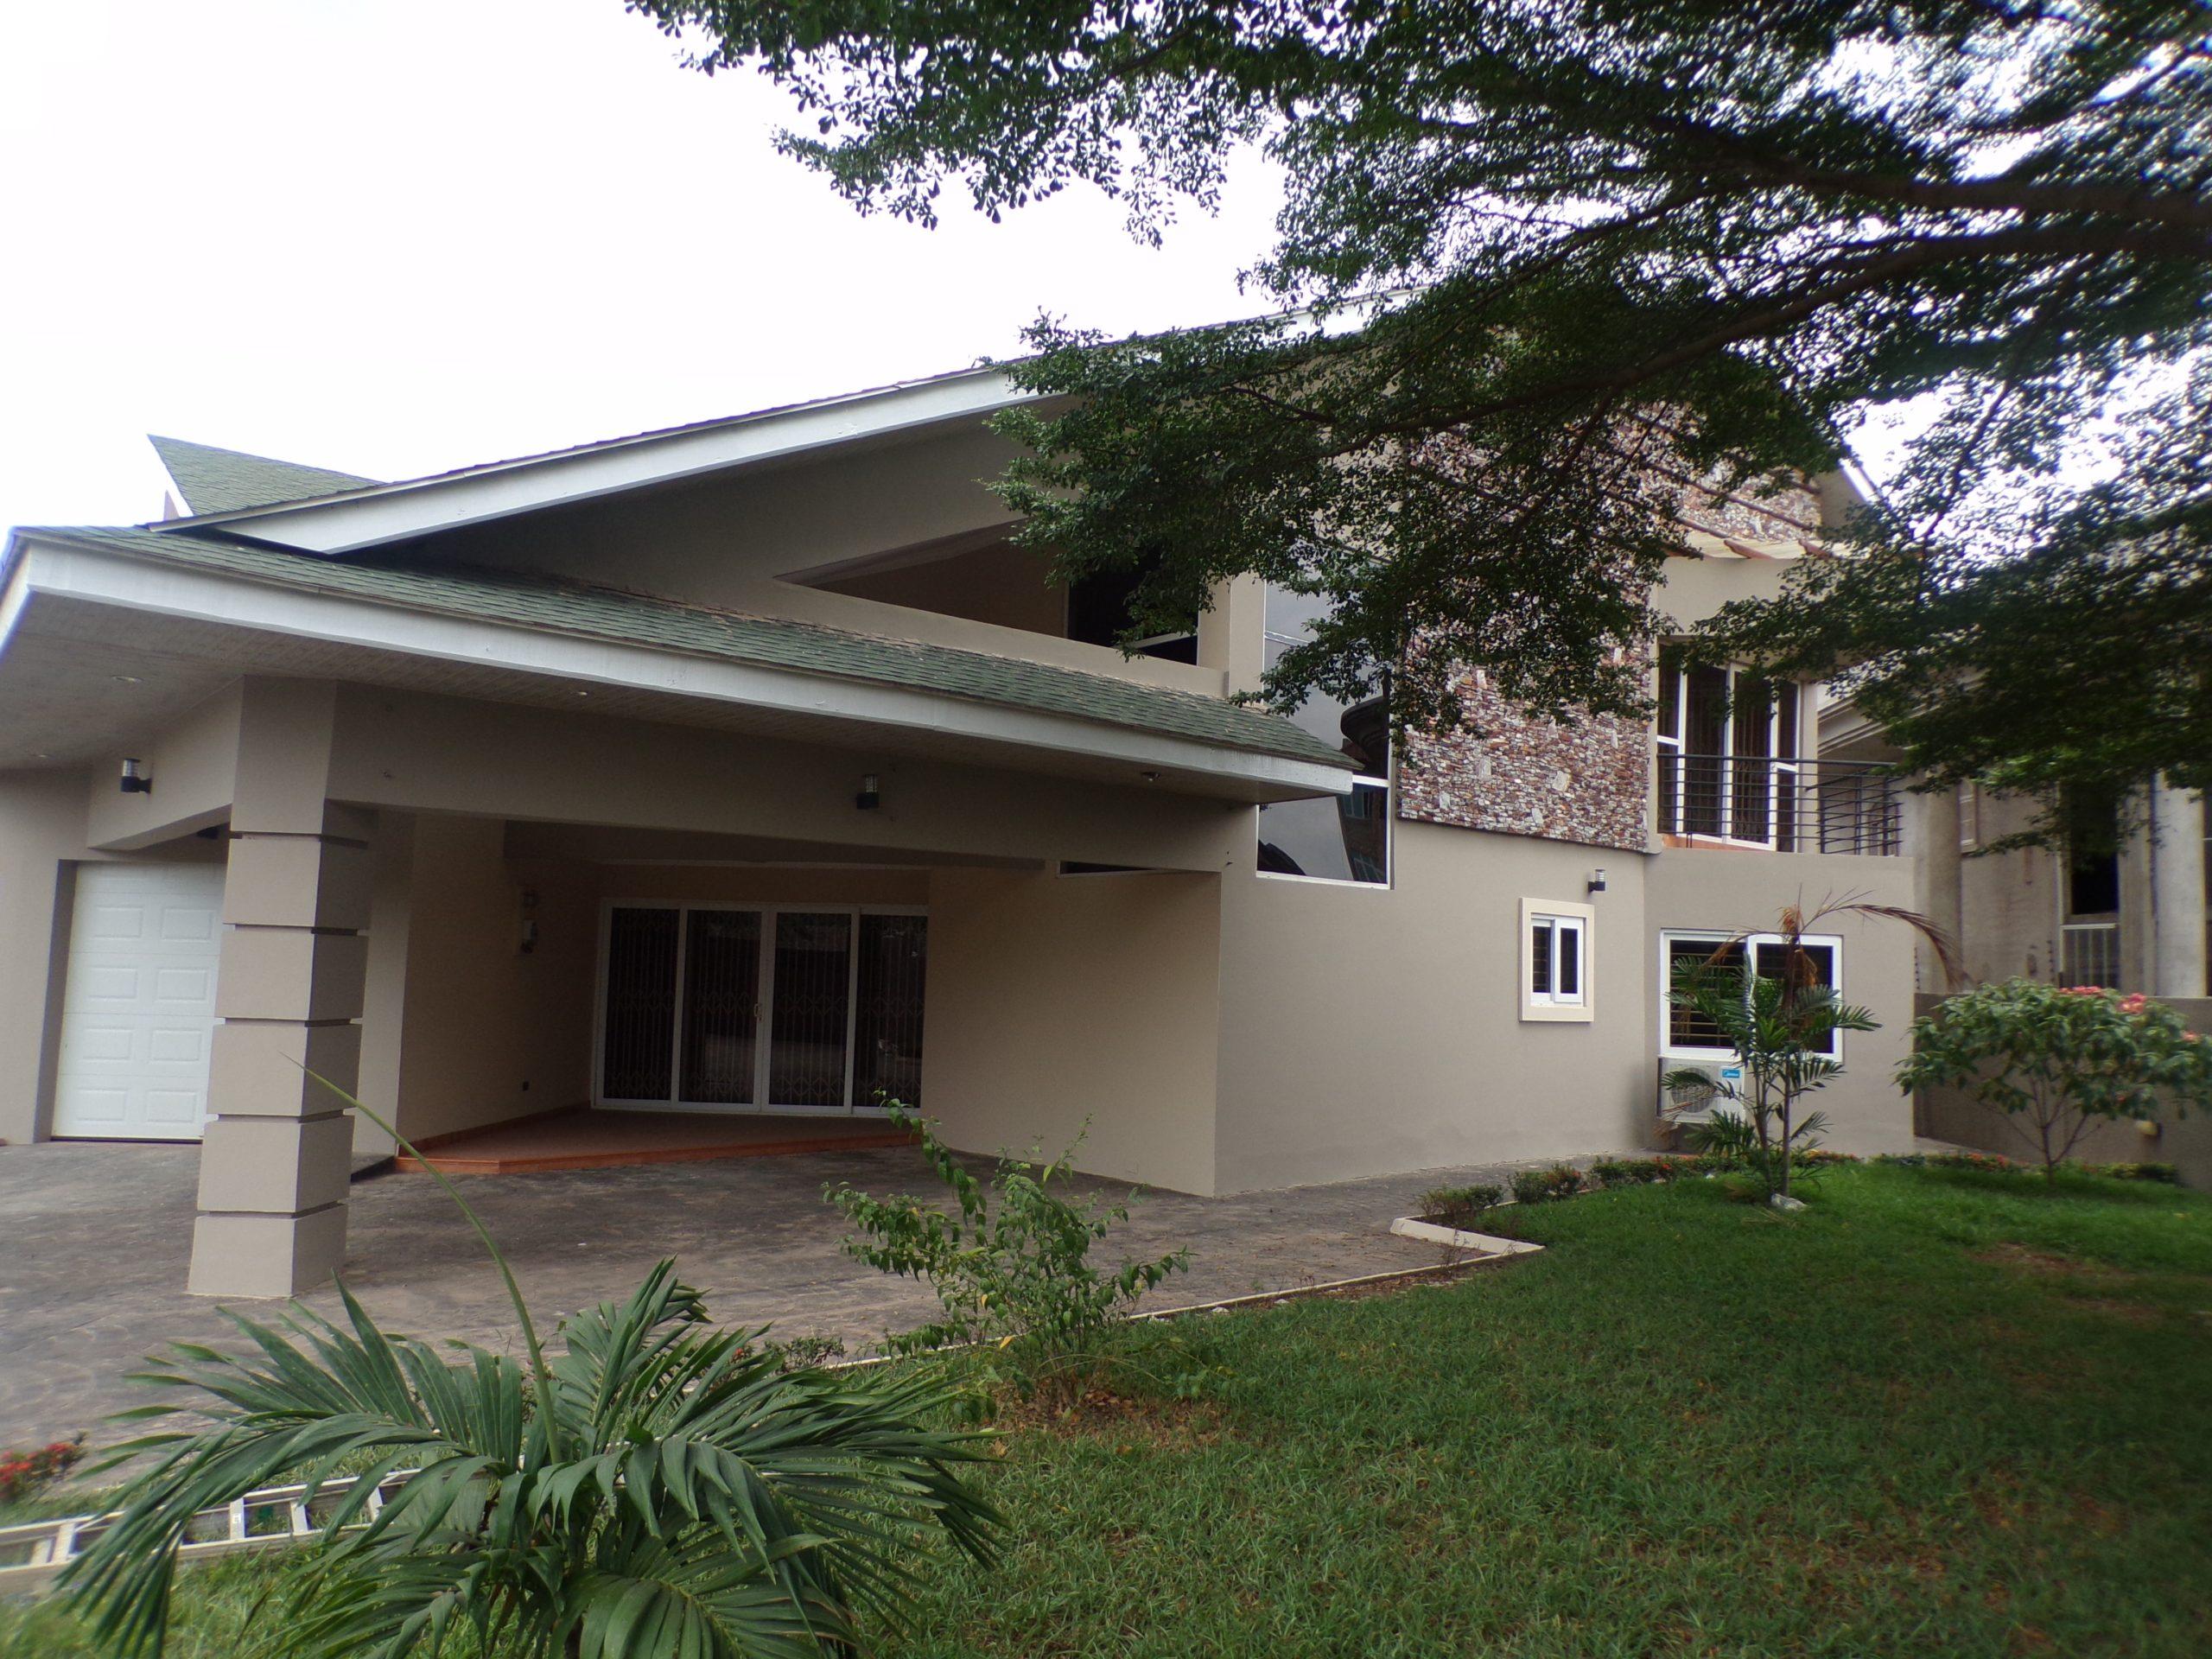 5 bedroom House for Rent at Adjiringanor